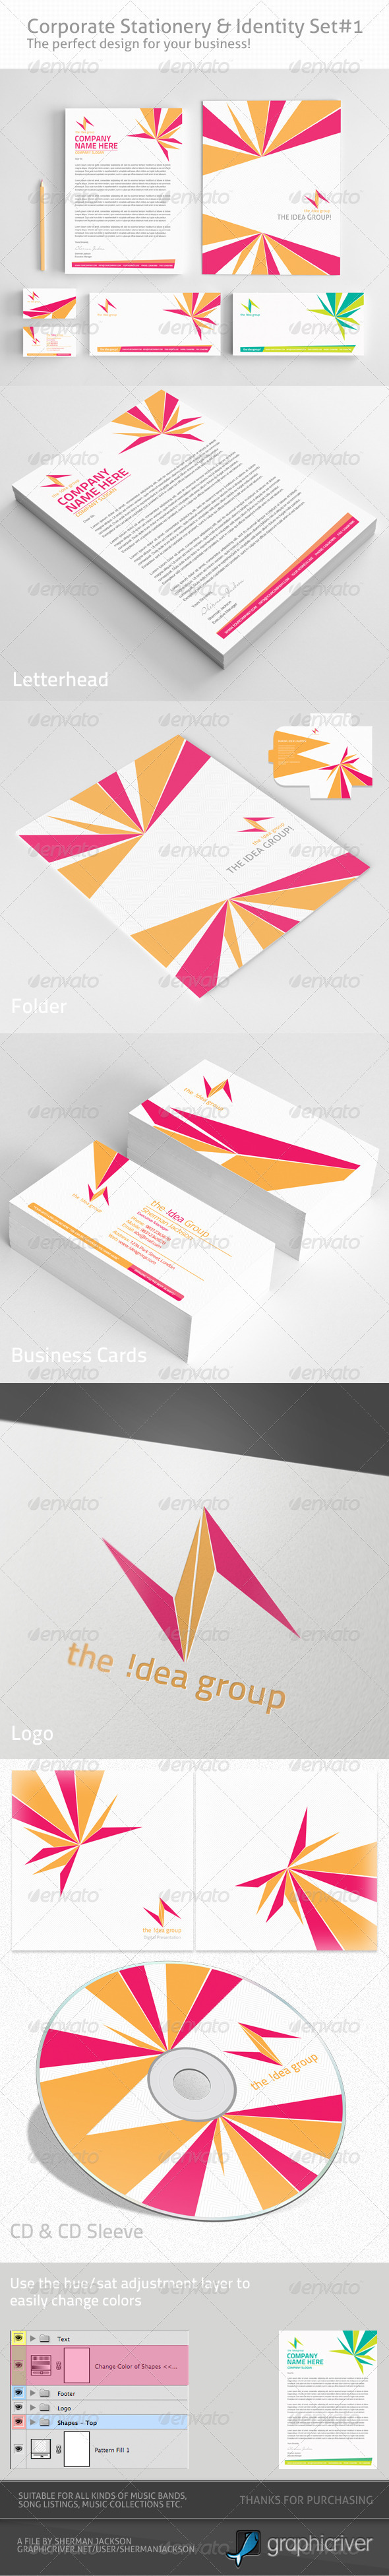 Corporate Identity & Stationery Set#1 (PSD) - Stationery Print Templates